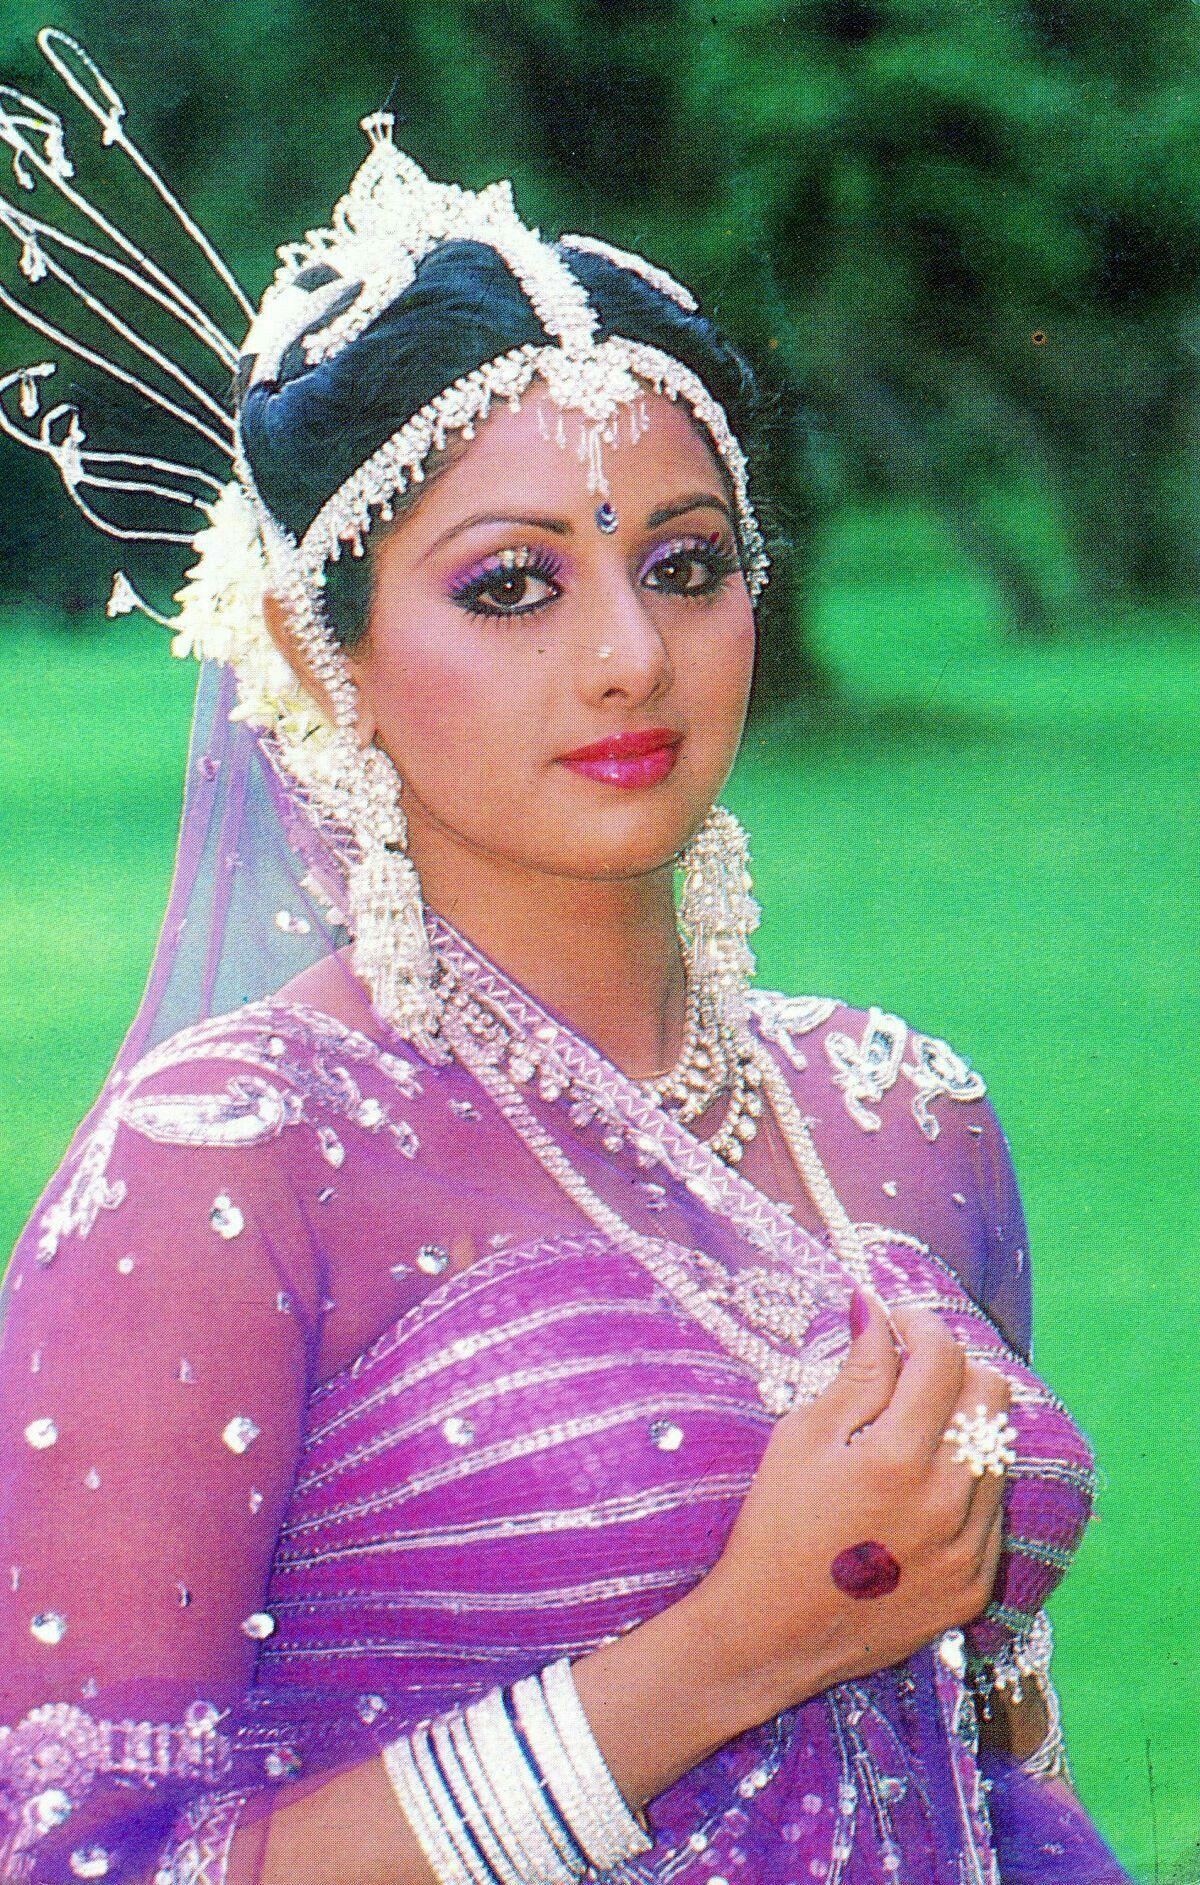 Pin by venkitapathy venkitapathy3132 on Indian Actress